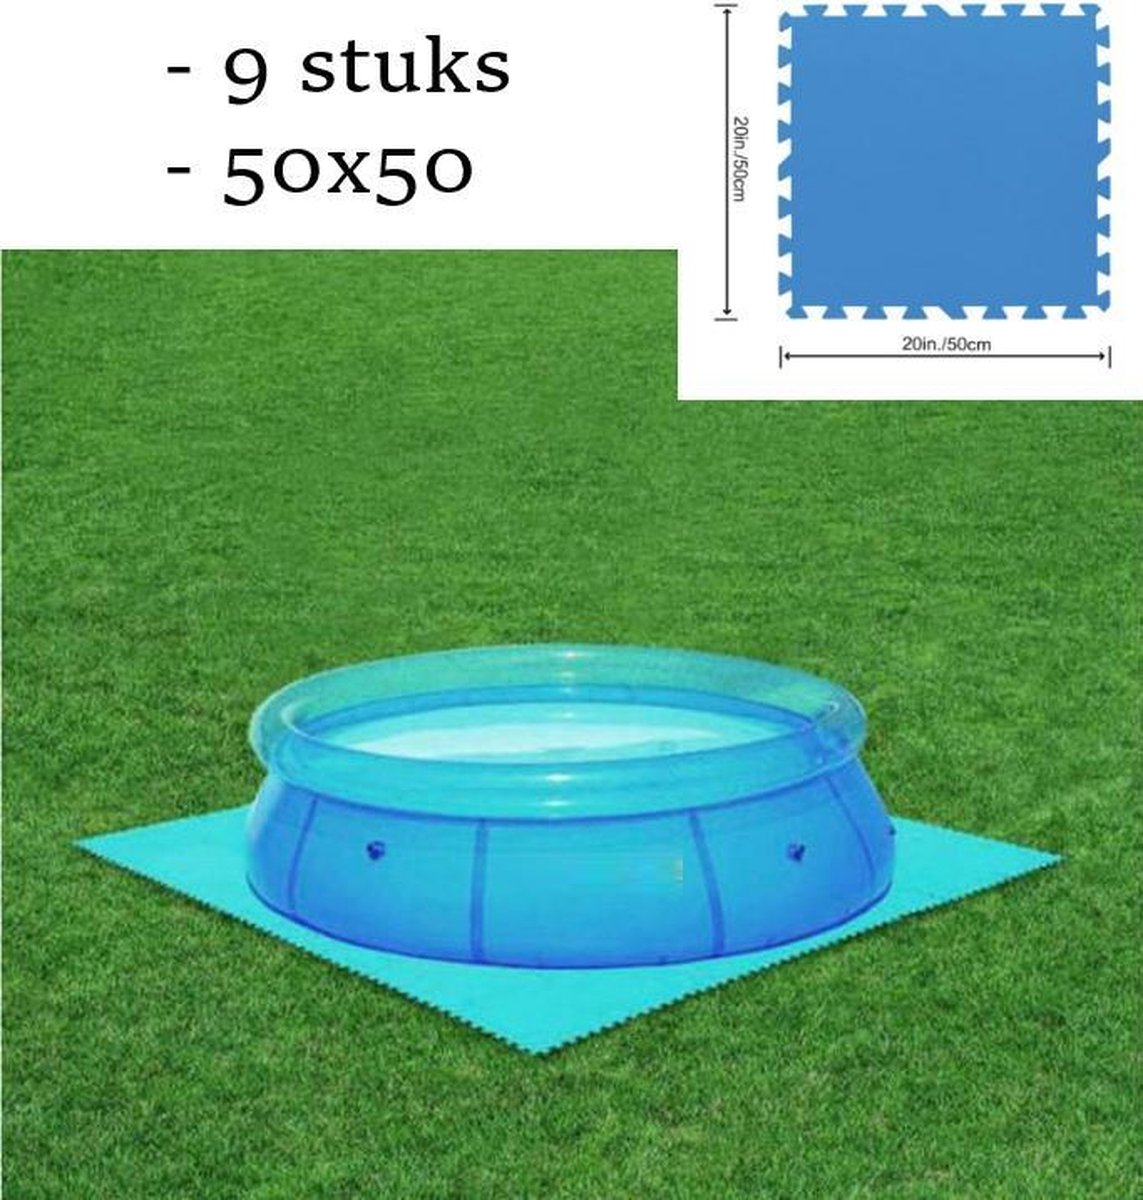 Vemia® Zwembad tegels - 500x500 - 9 stuks - Zwembad ondervloer